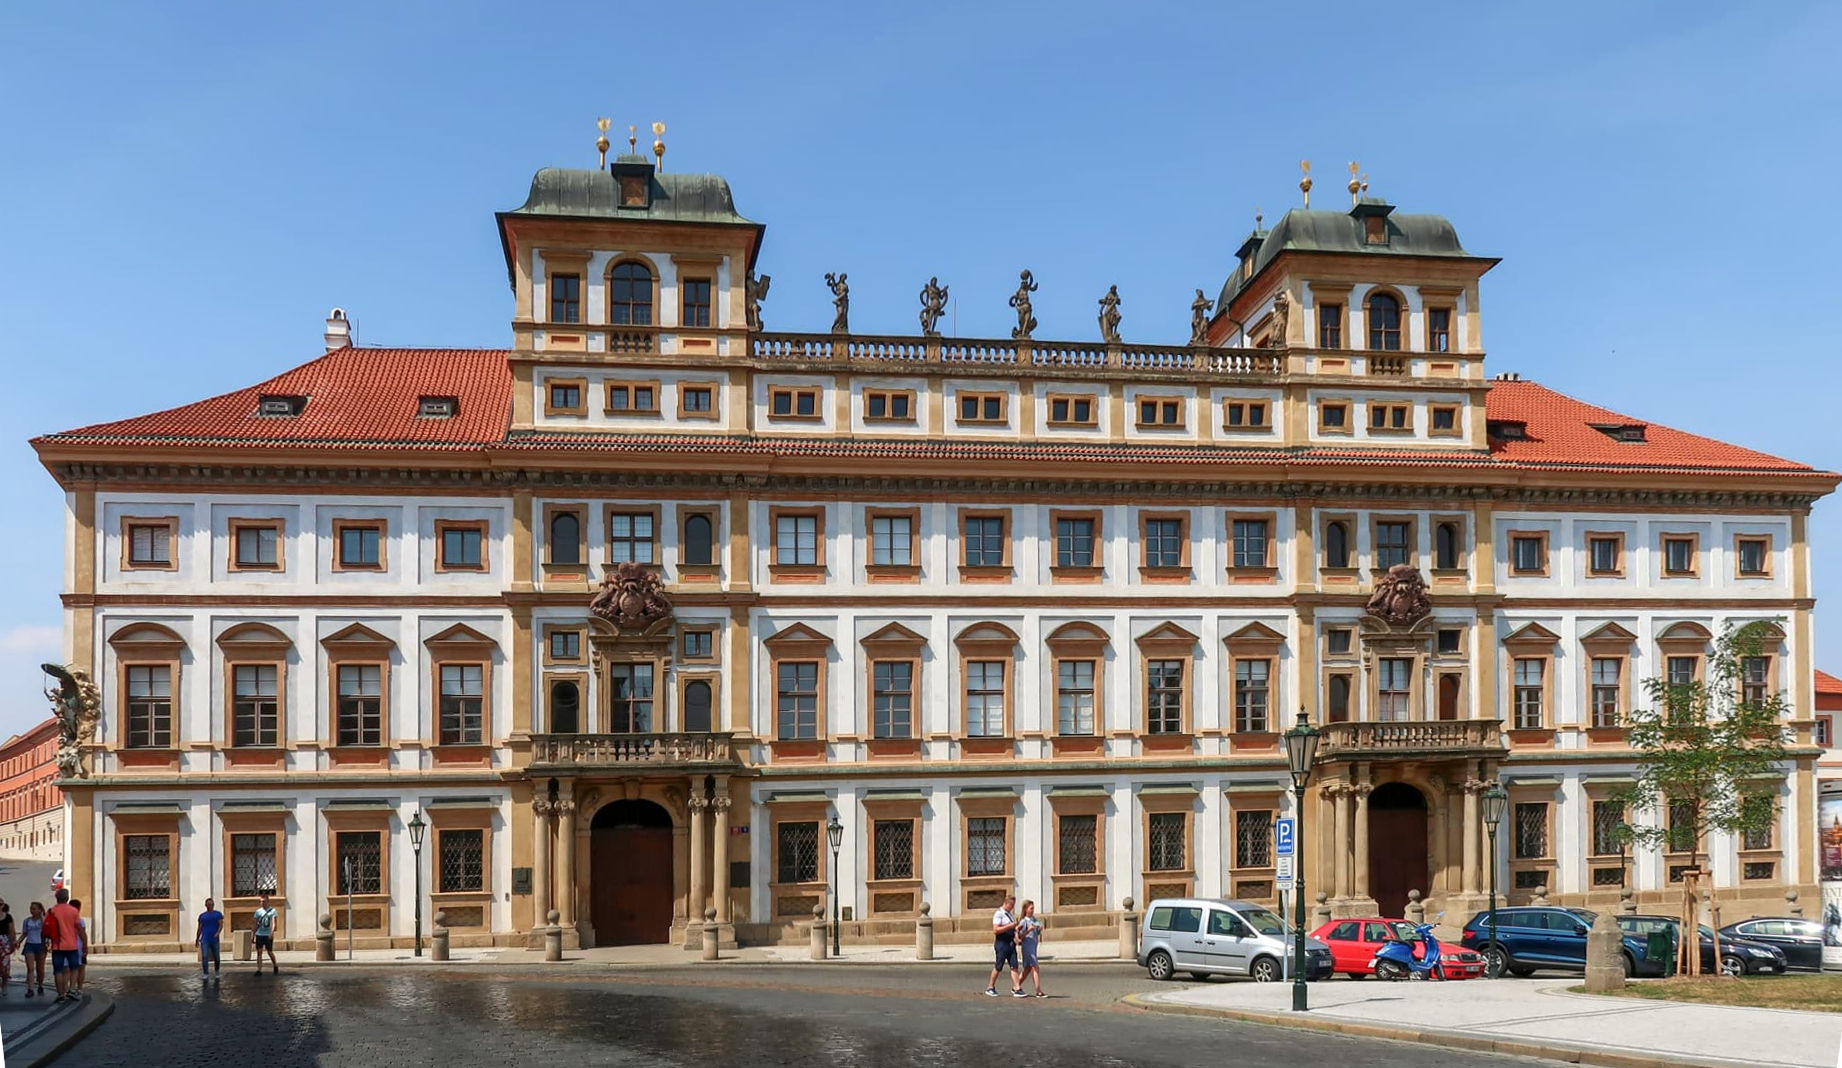 Тосканский дворец в Праге.